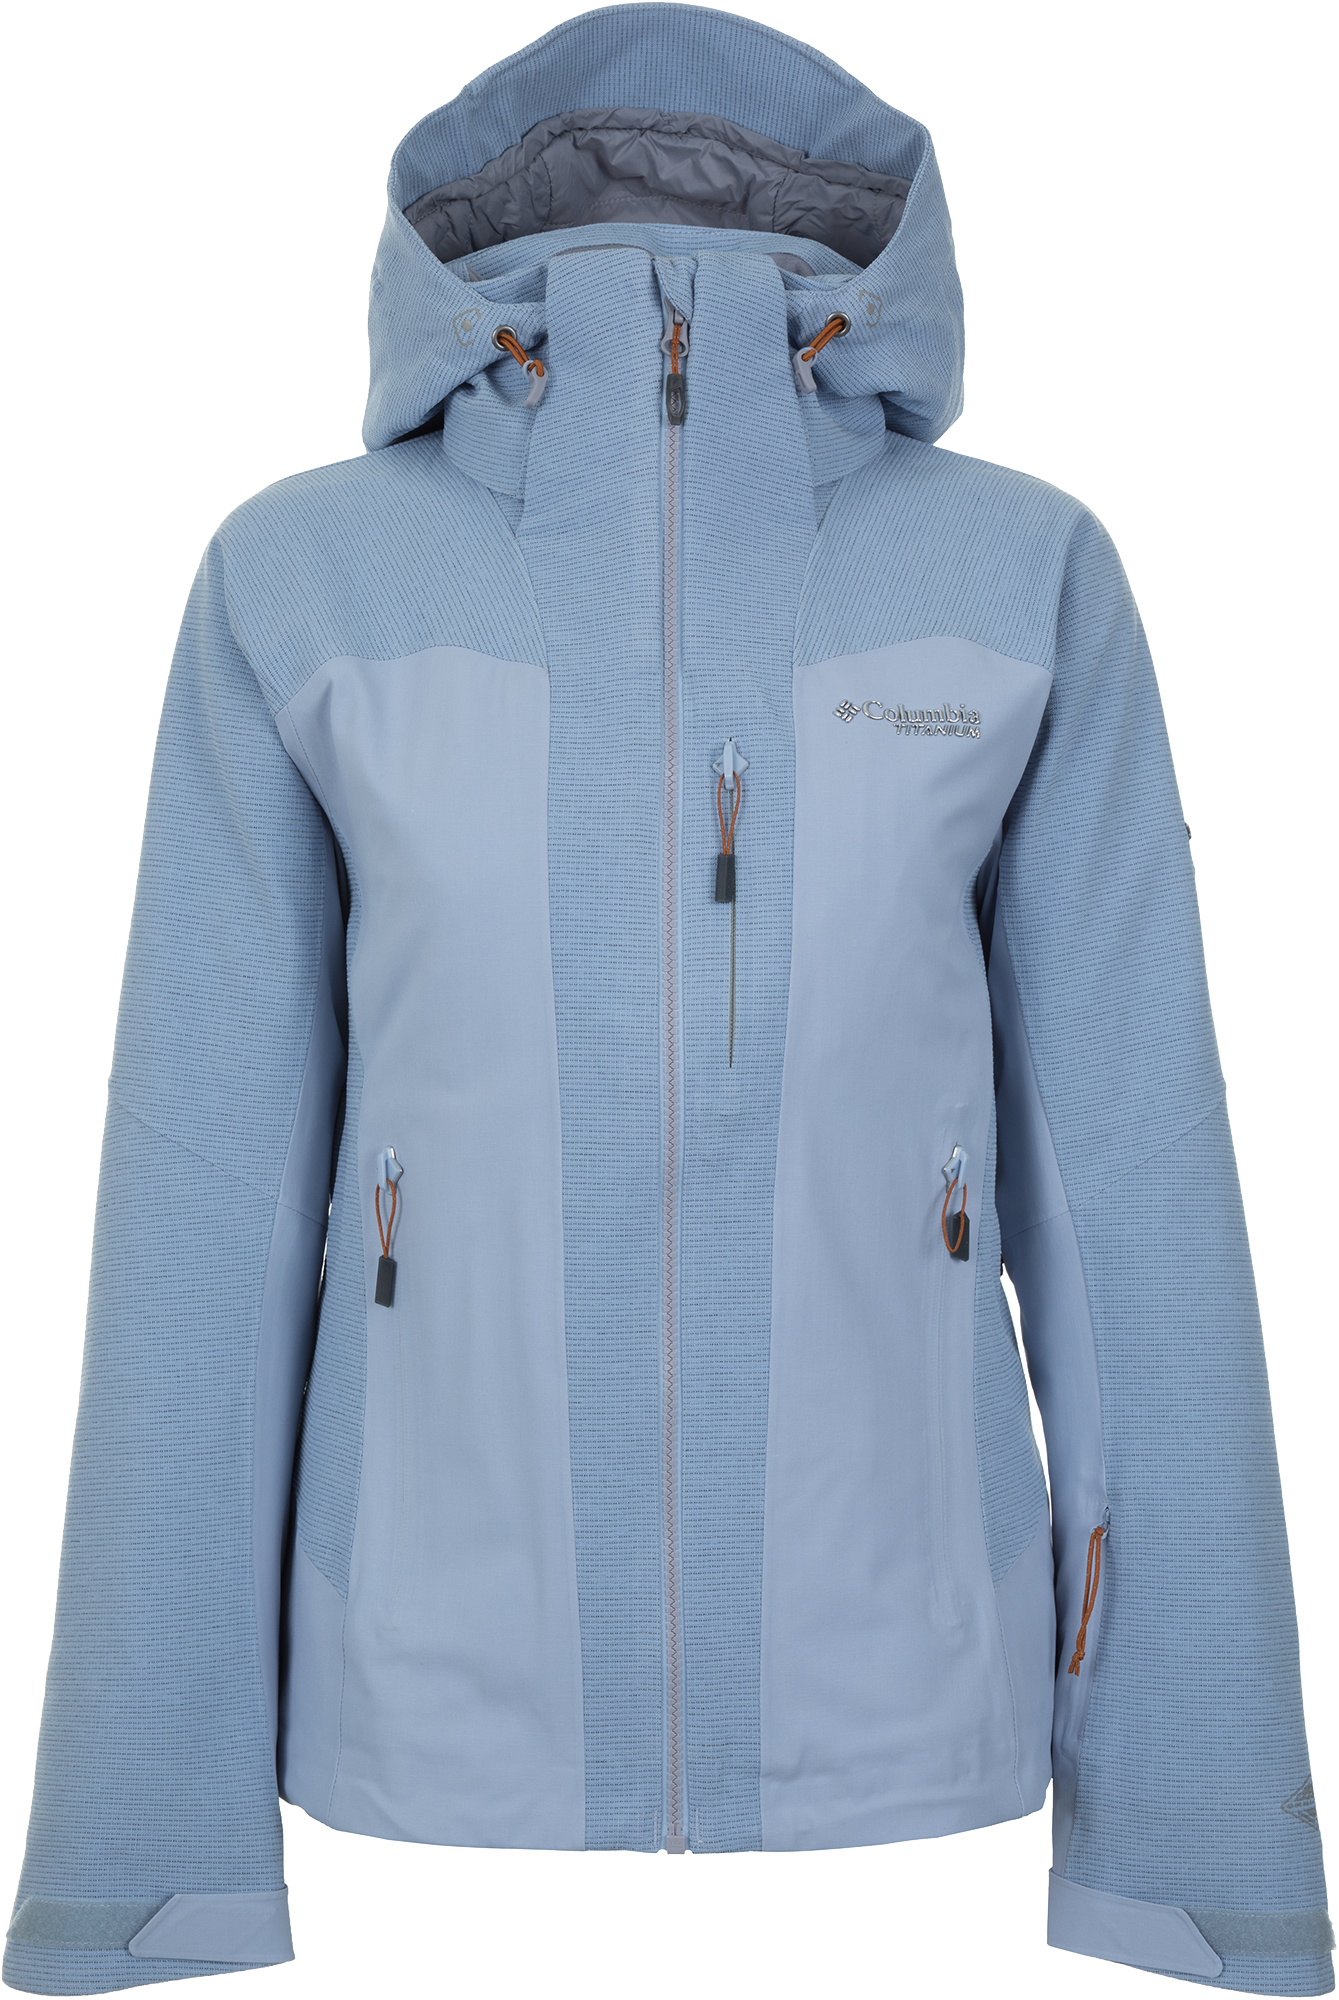 Columbia Куртка утепленная женская Columbia Powder Keg II, размер 42